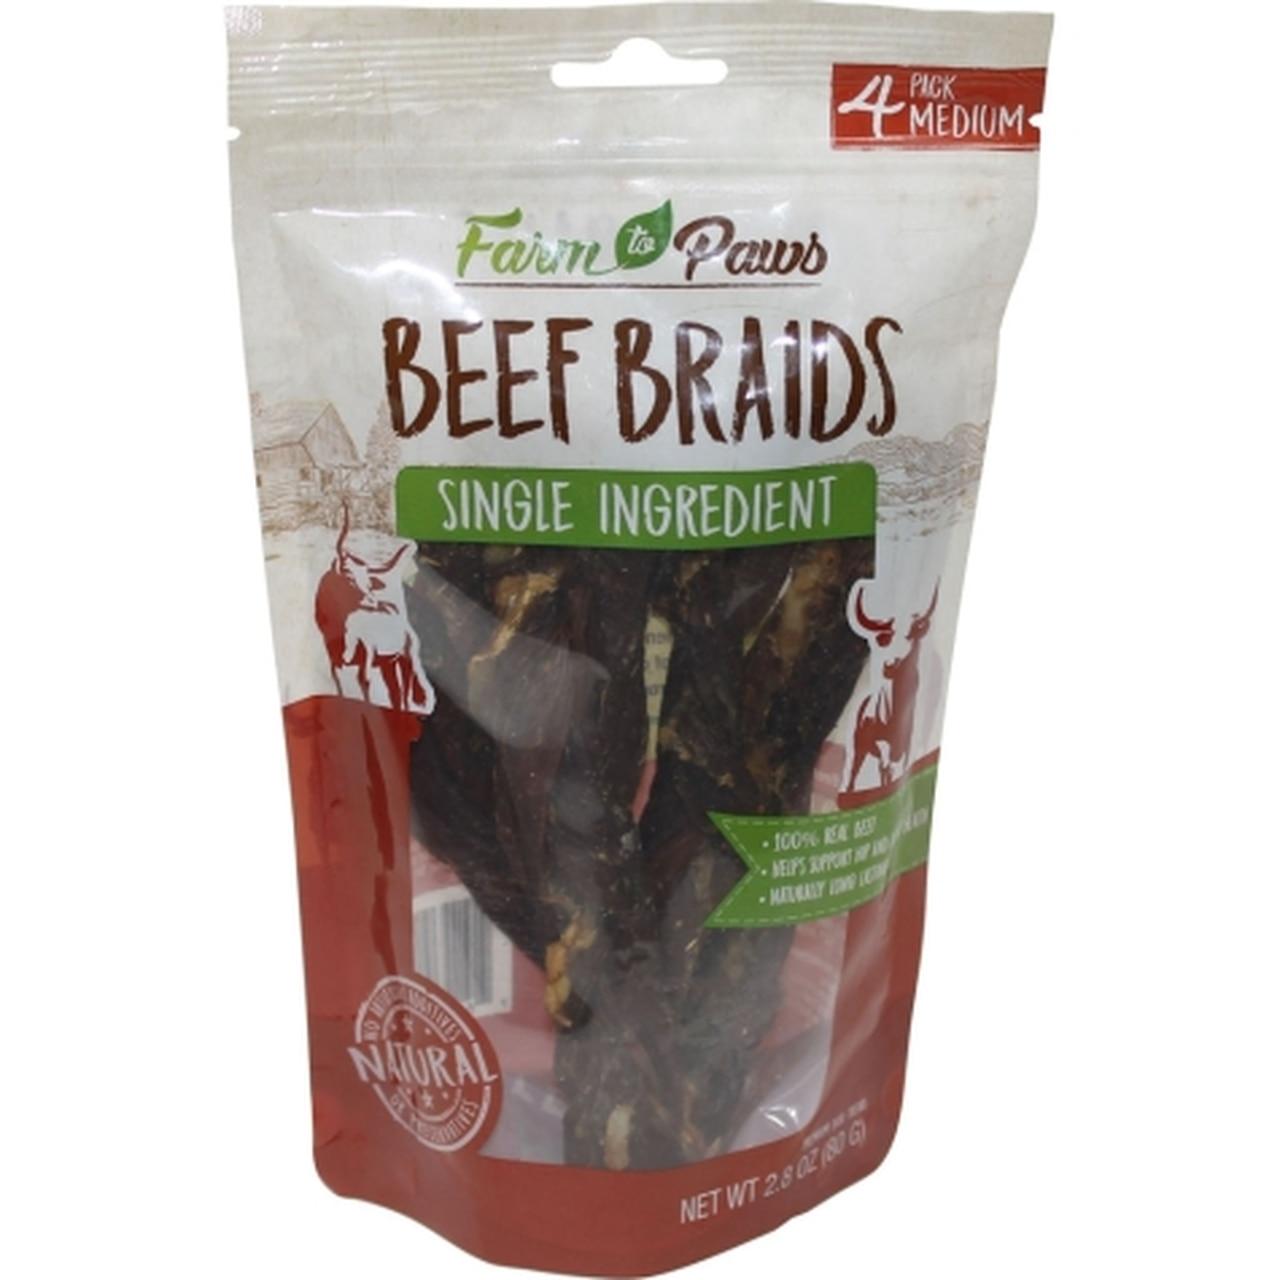 Farm to Paws Beef Braids Dog Treats, Medium, 4-pk